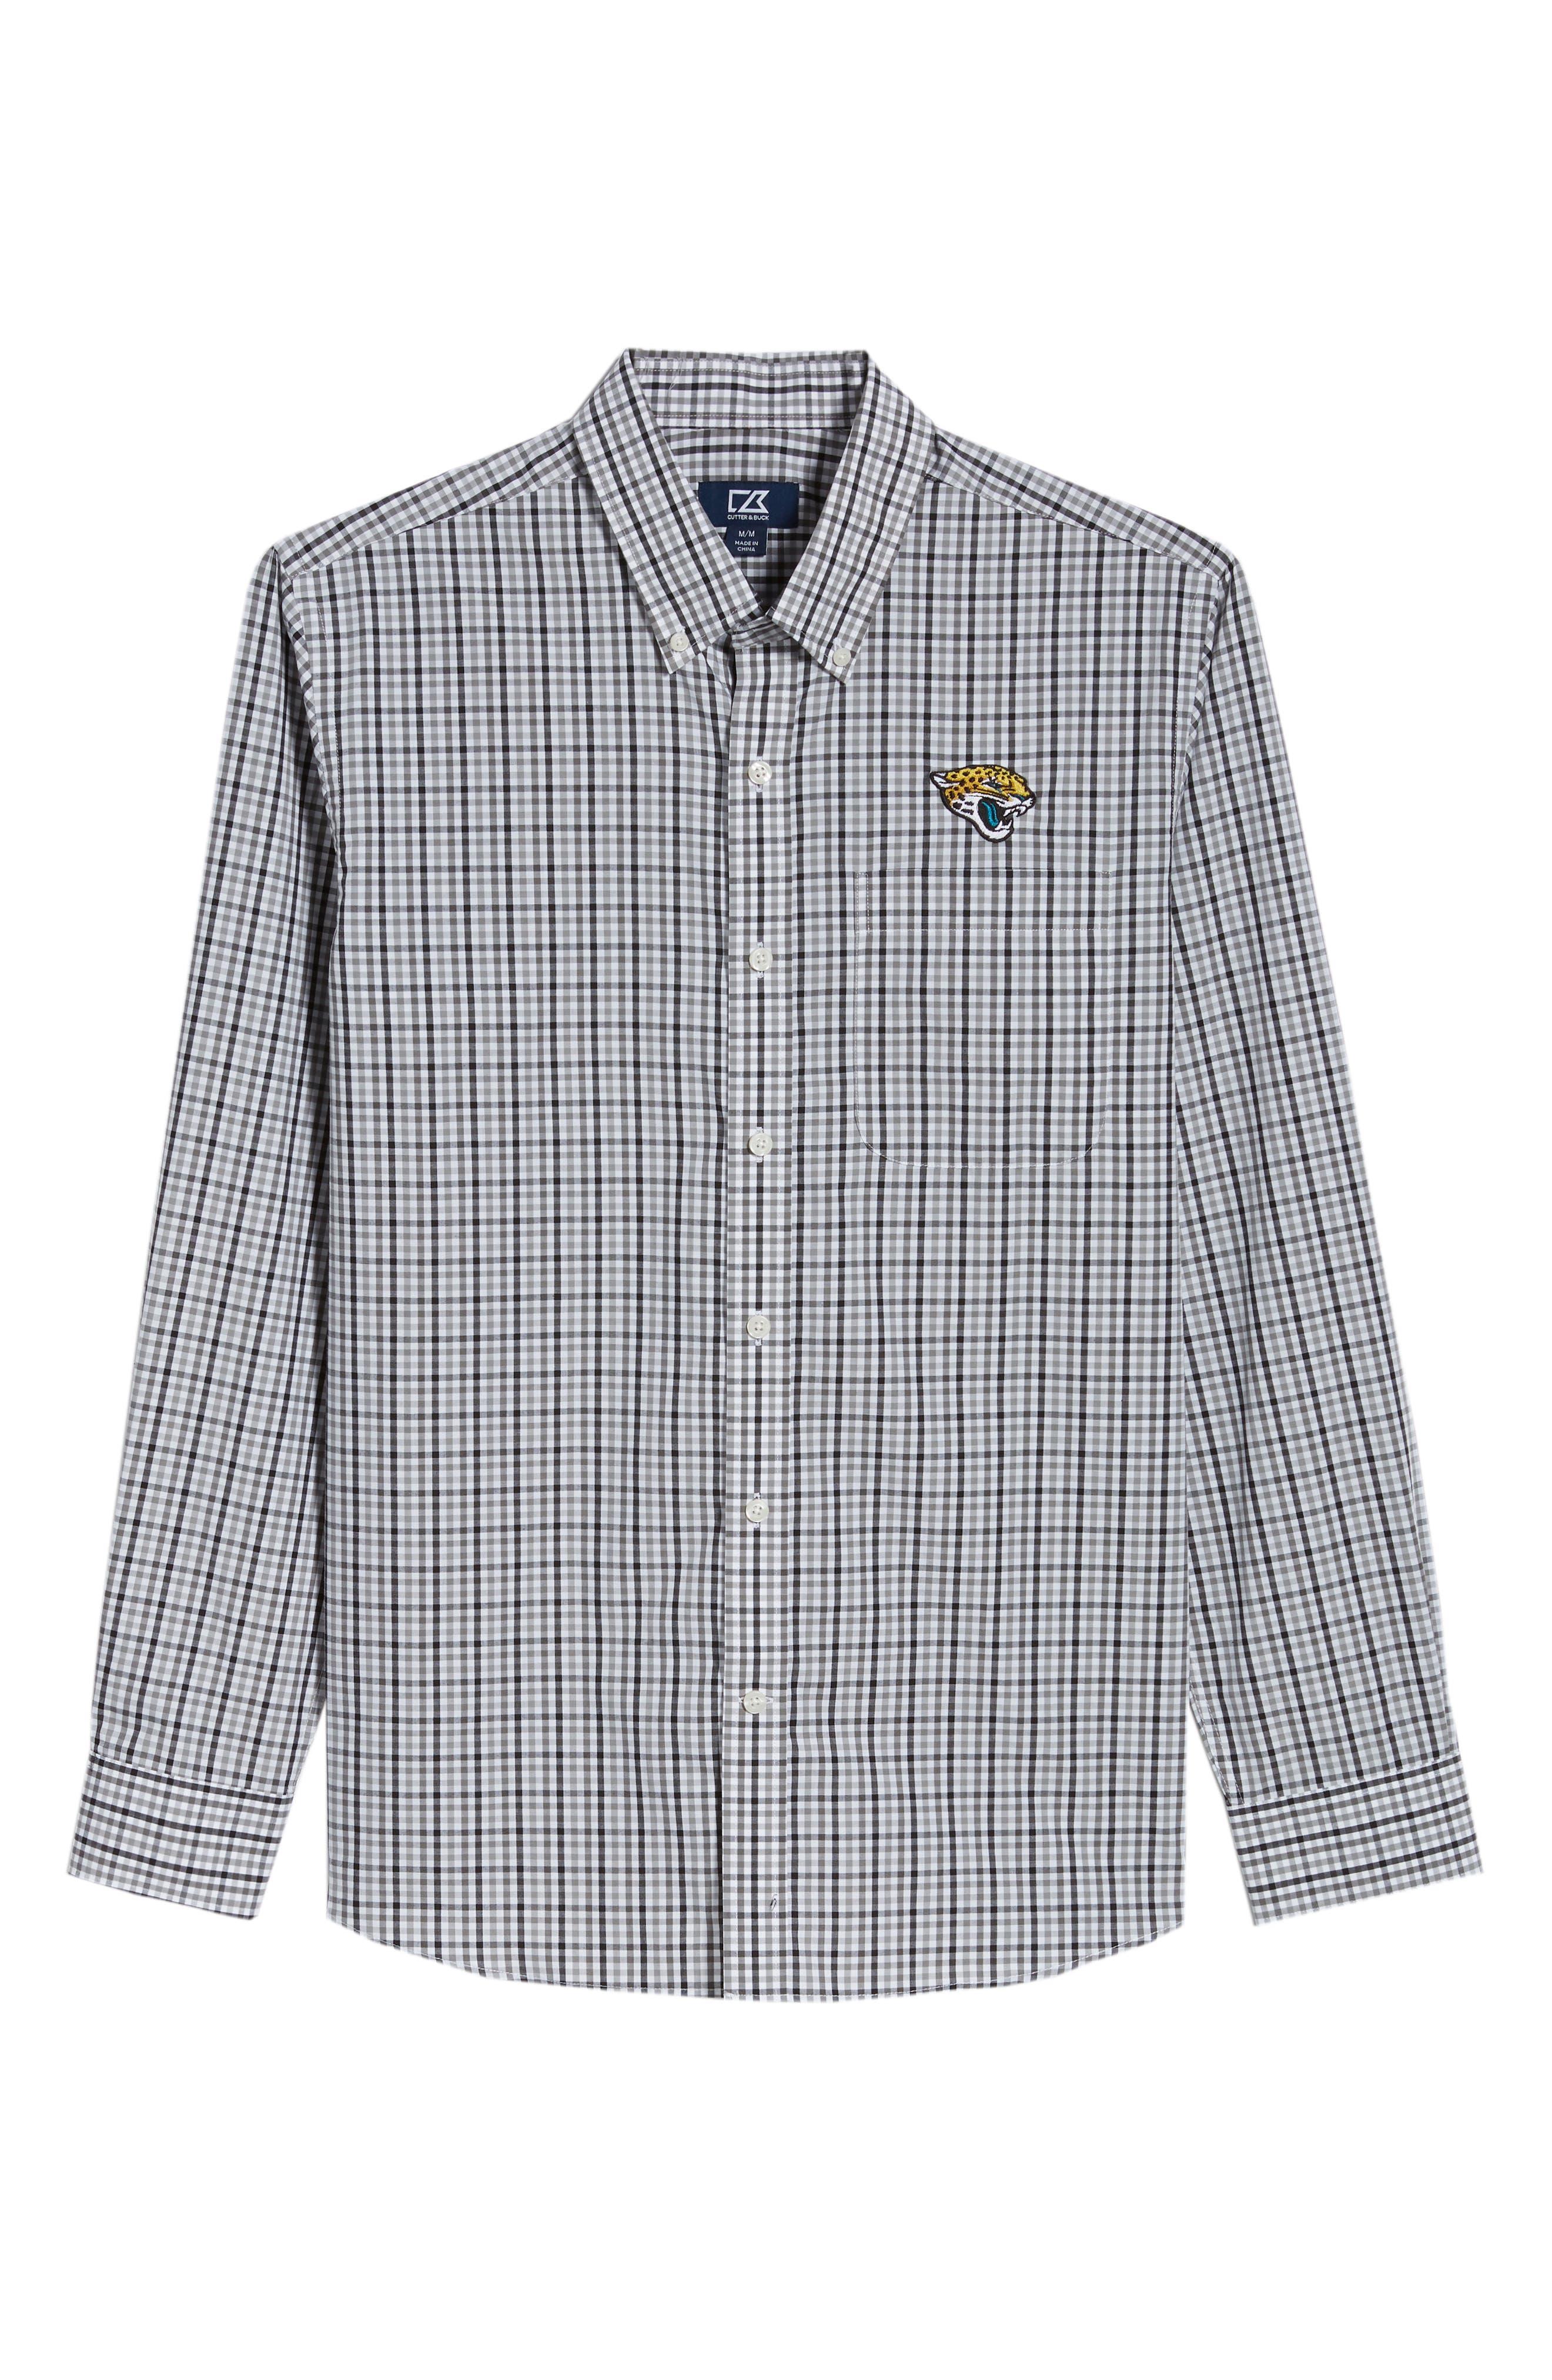 Jacksonville Jaguars - Gilman Regular Fit Plaid Sport Shirt,                             Alternate thumbnail 6, color,                             BLACK